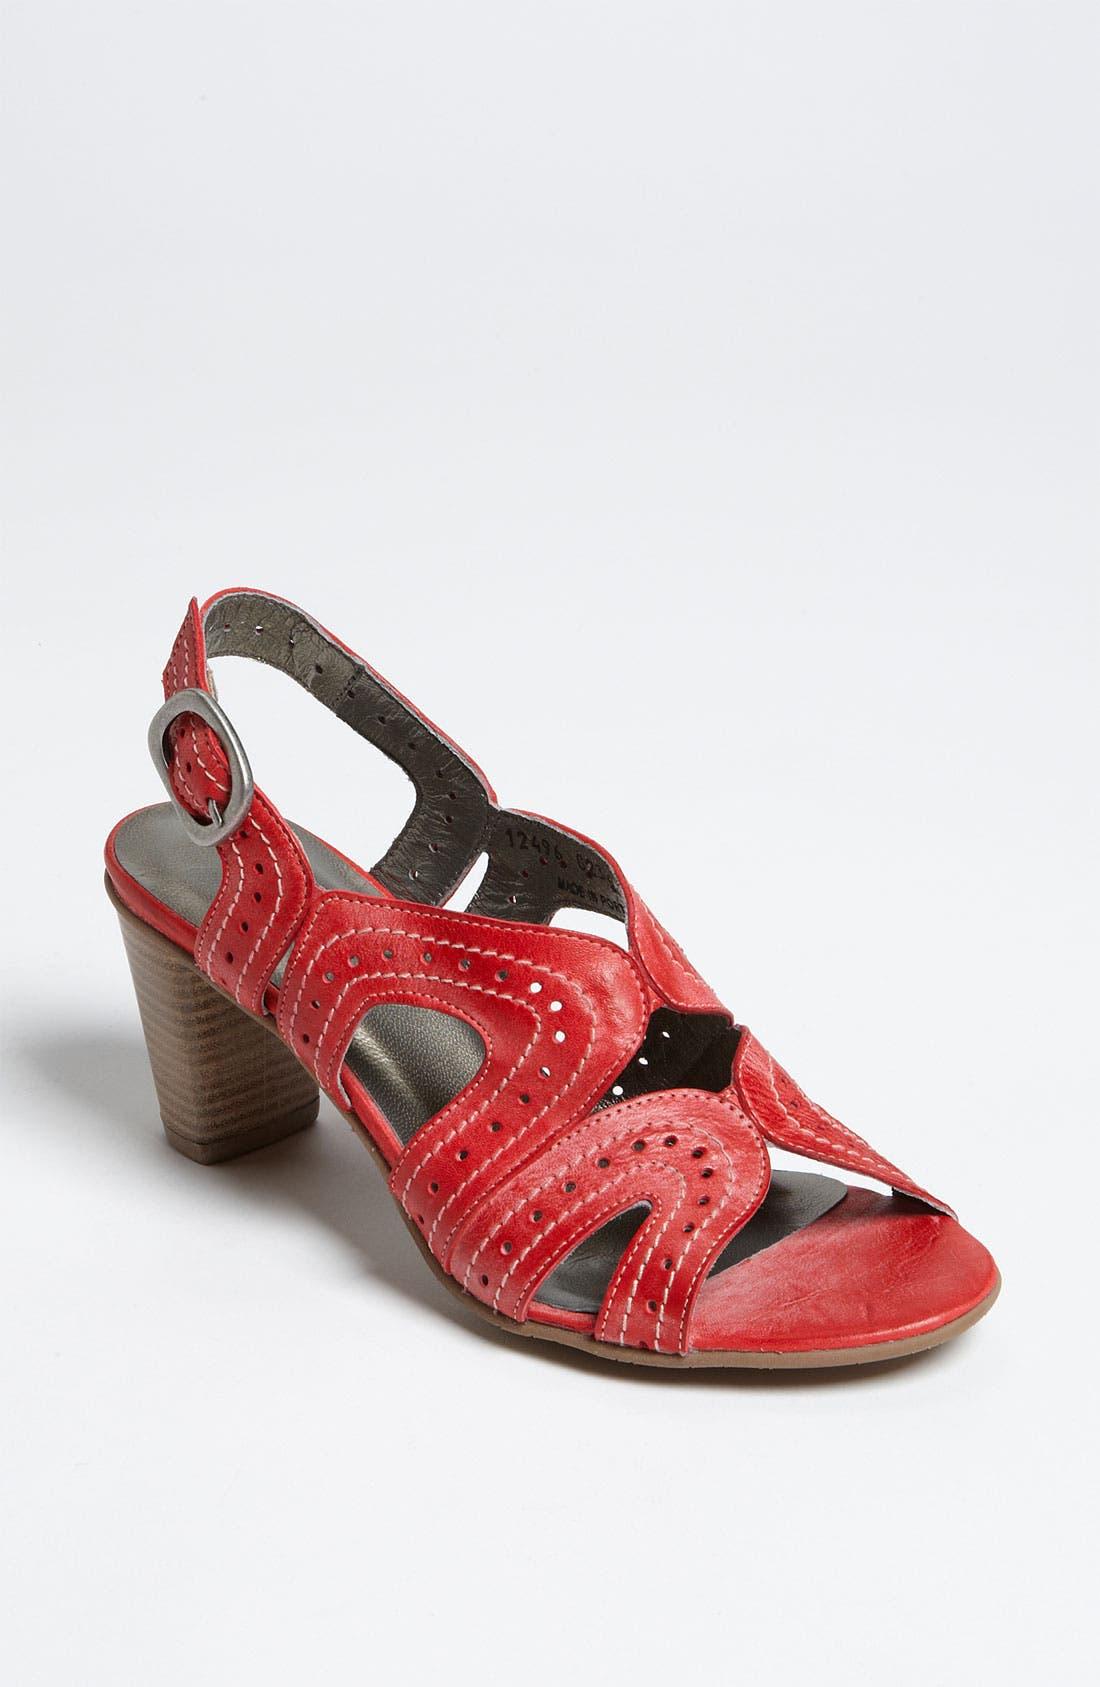 Alternate Image 1 Selected - Fidji 'Brooke' Sandal